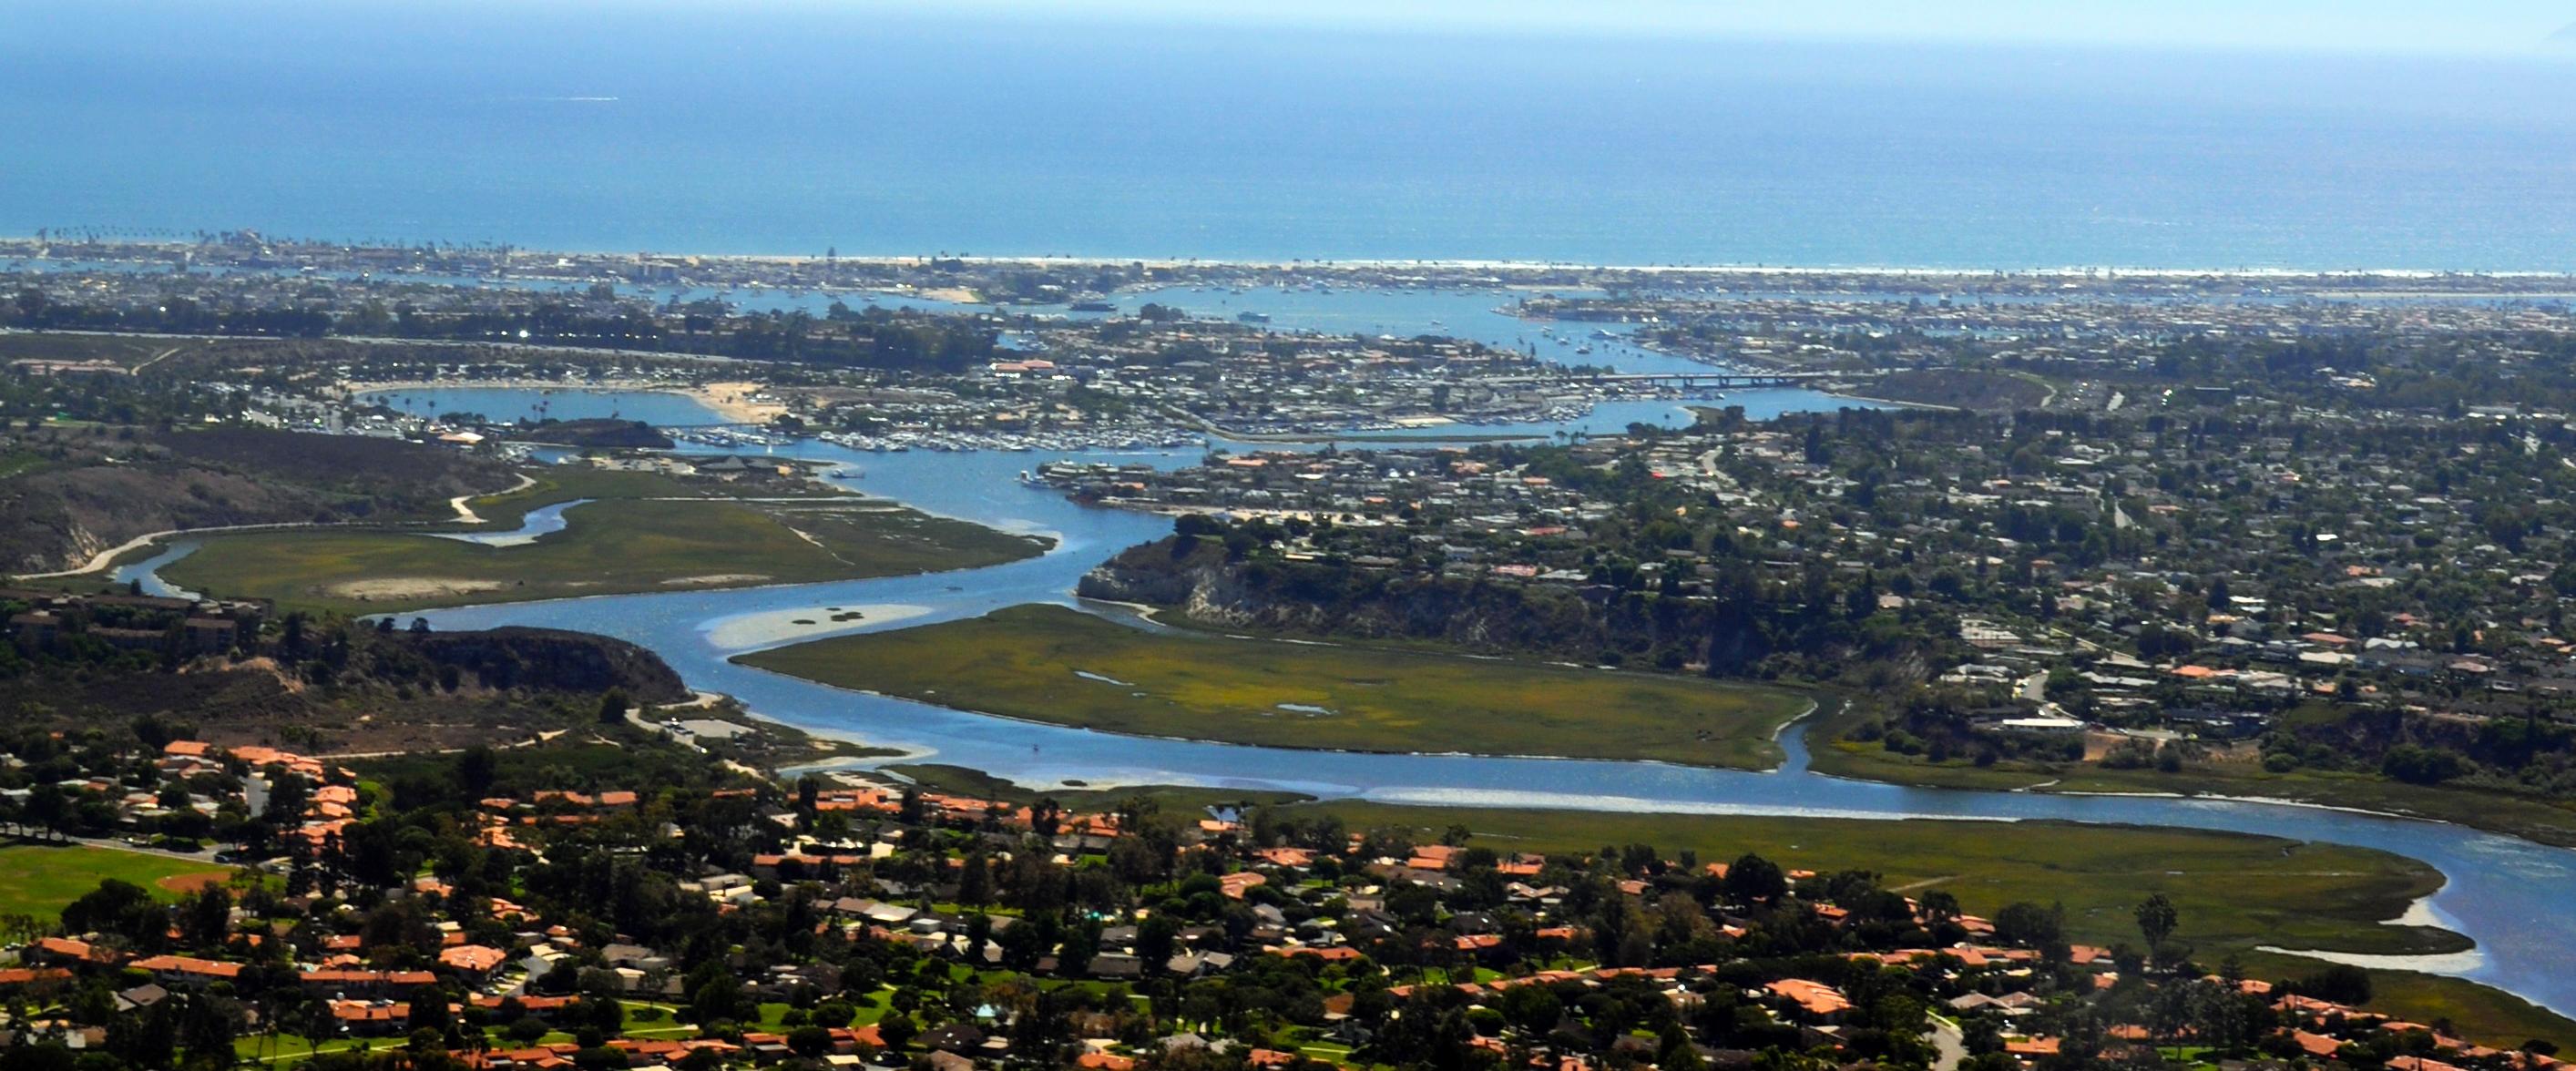 History Of Newport Beach California